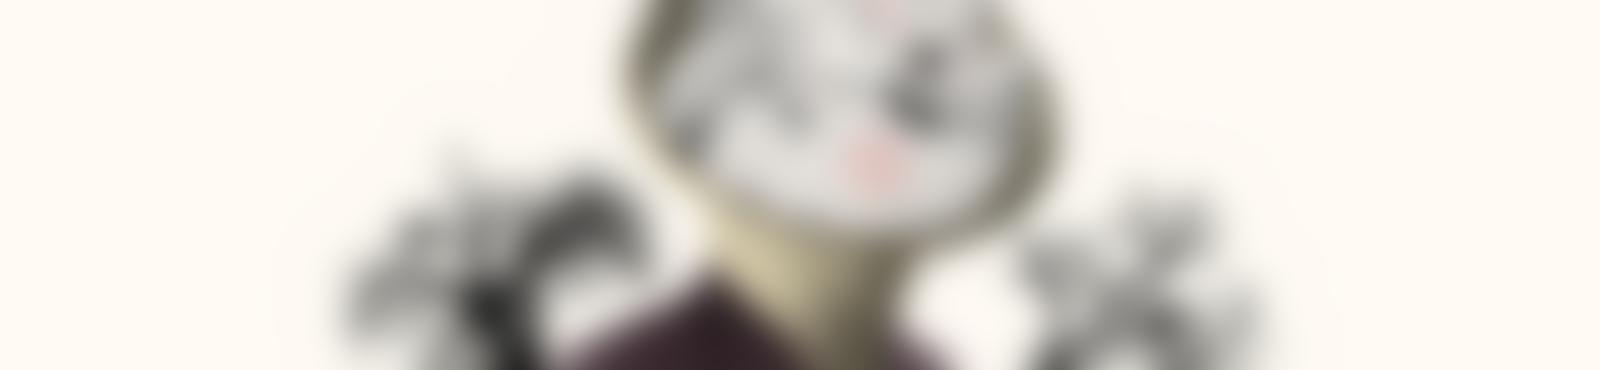 Blurred 7c989c08 bfea 4056 8155 f80130000643